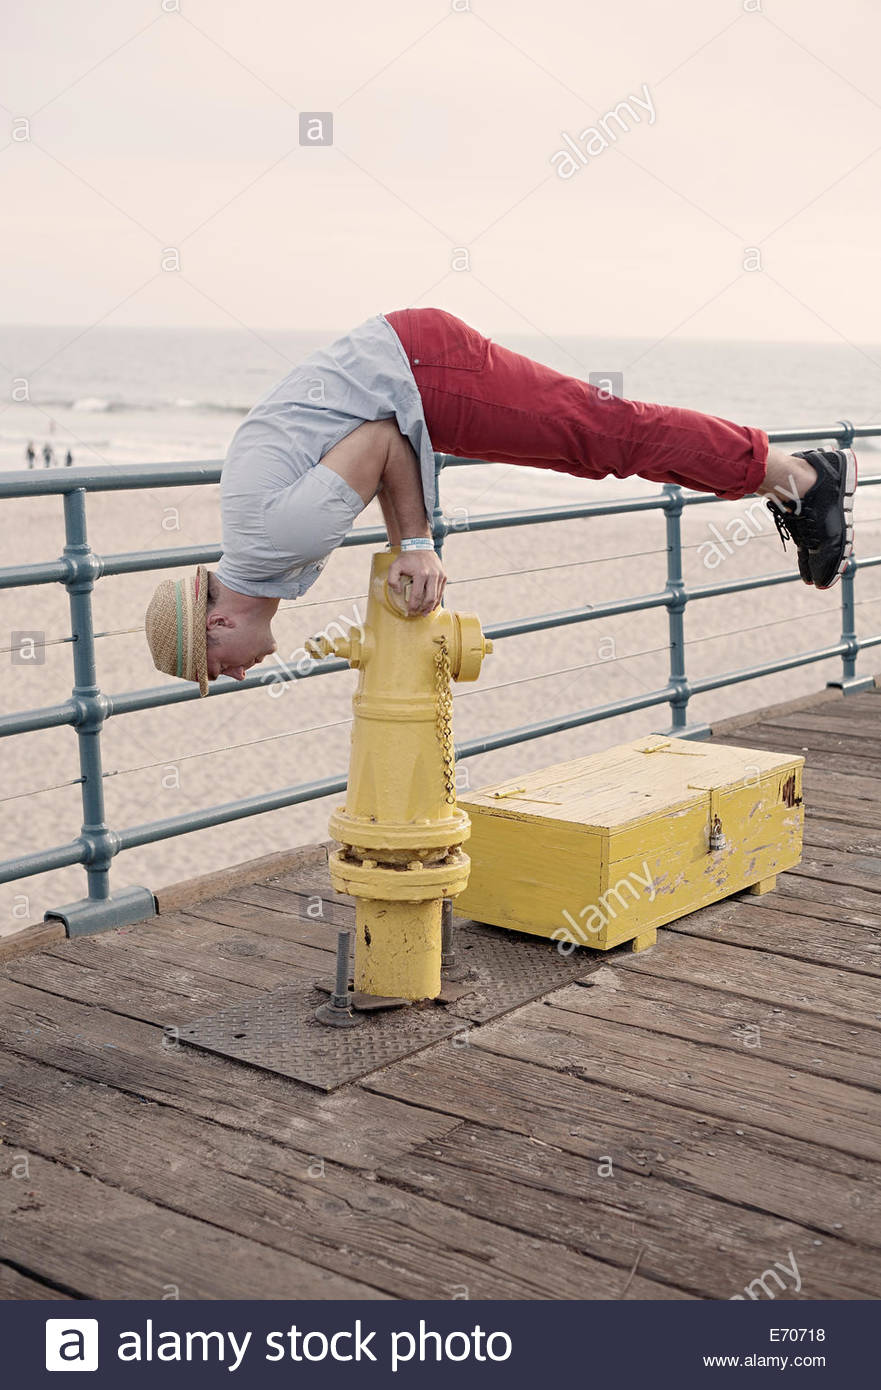 Young man doing push ups on fire hydrant, Santa Monica, California, USA - Stock Image